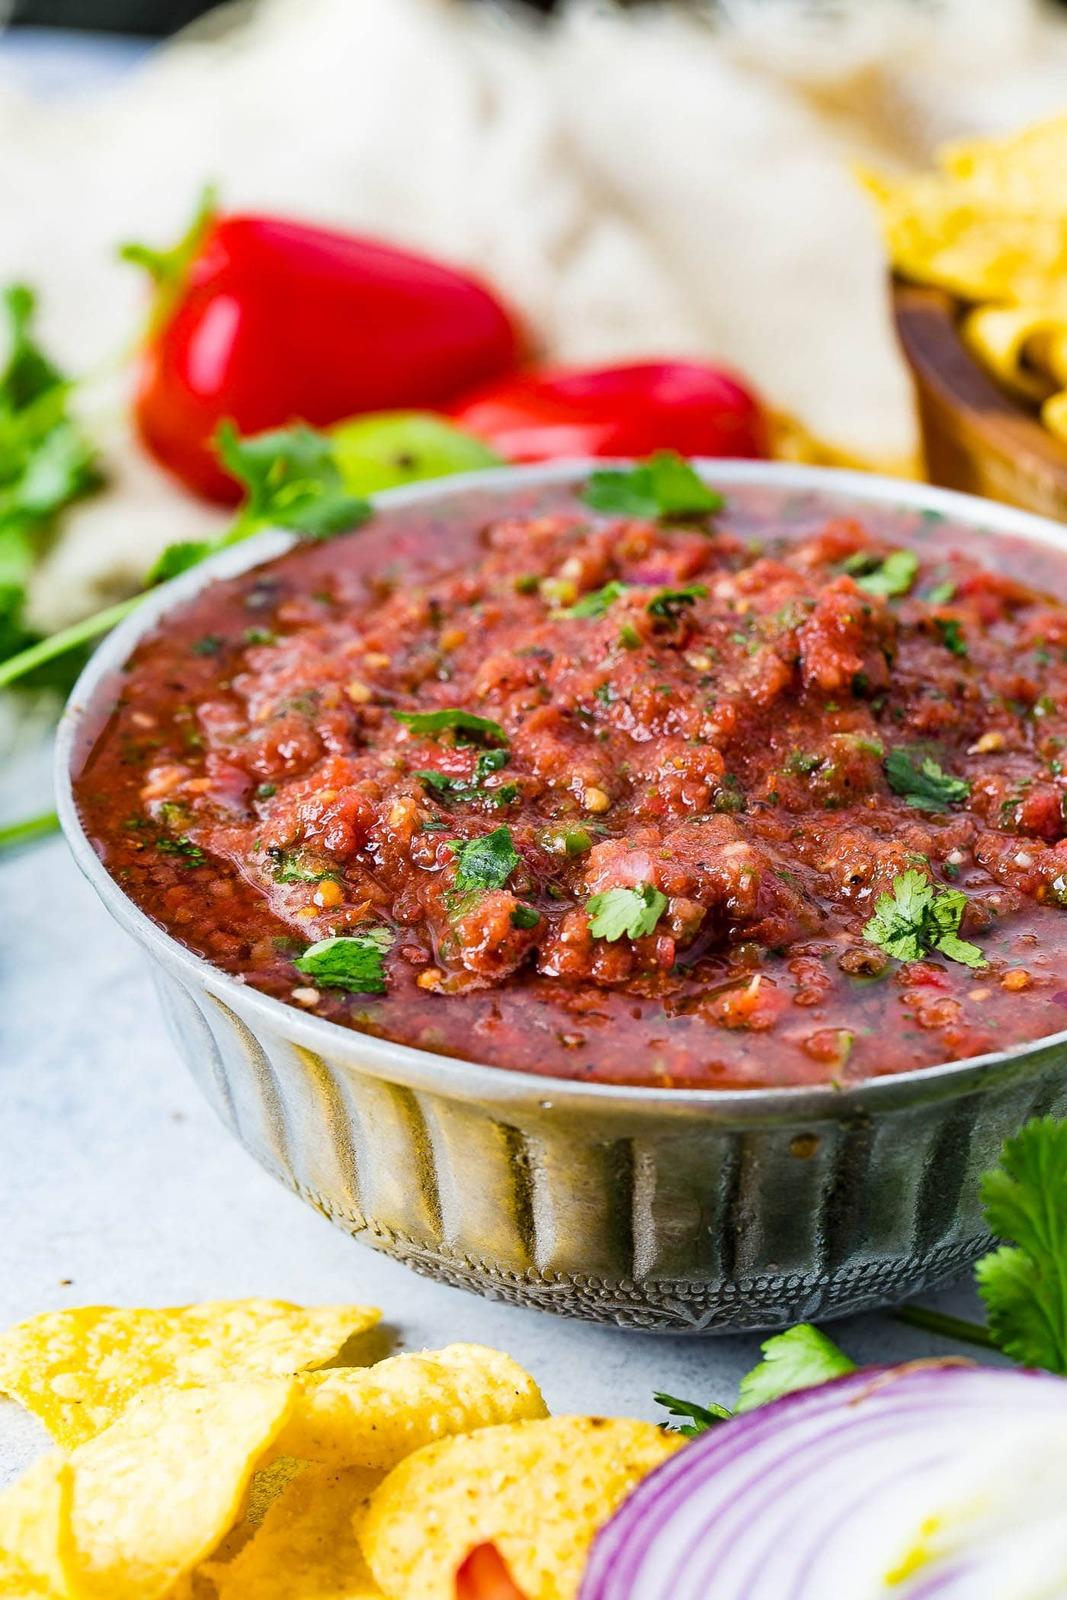 how-to-make-homemade-salsa-recipe-8.jpg